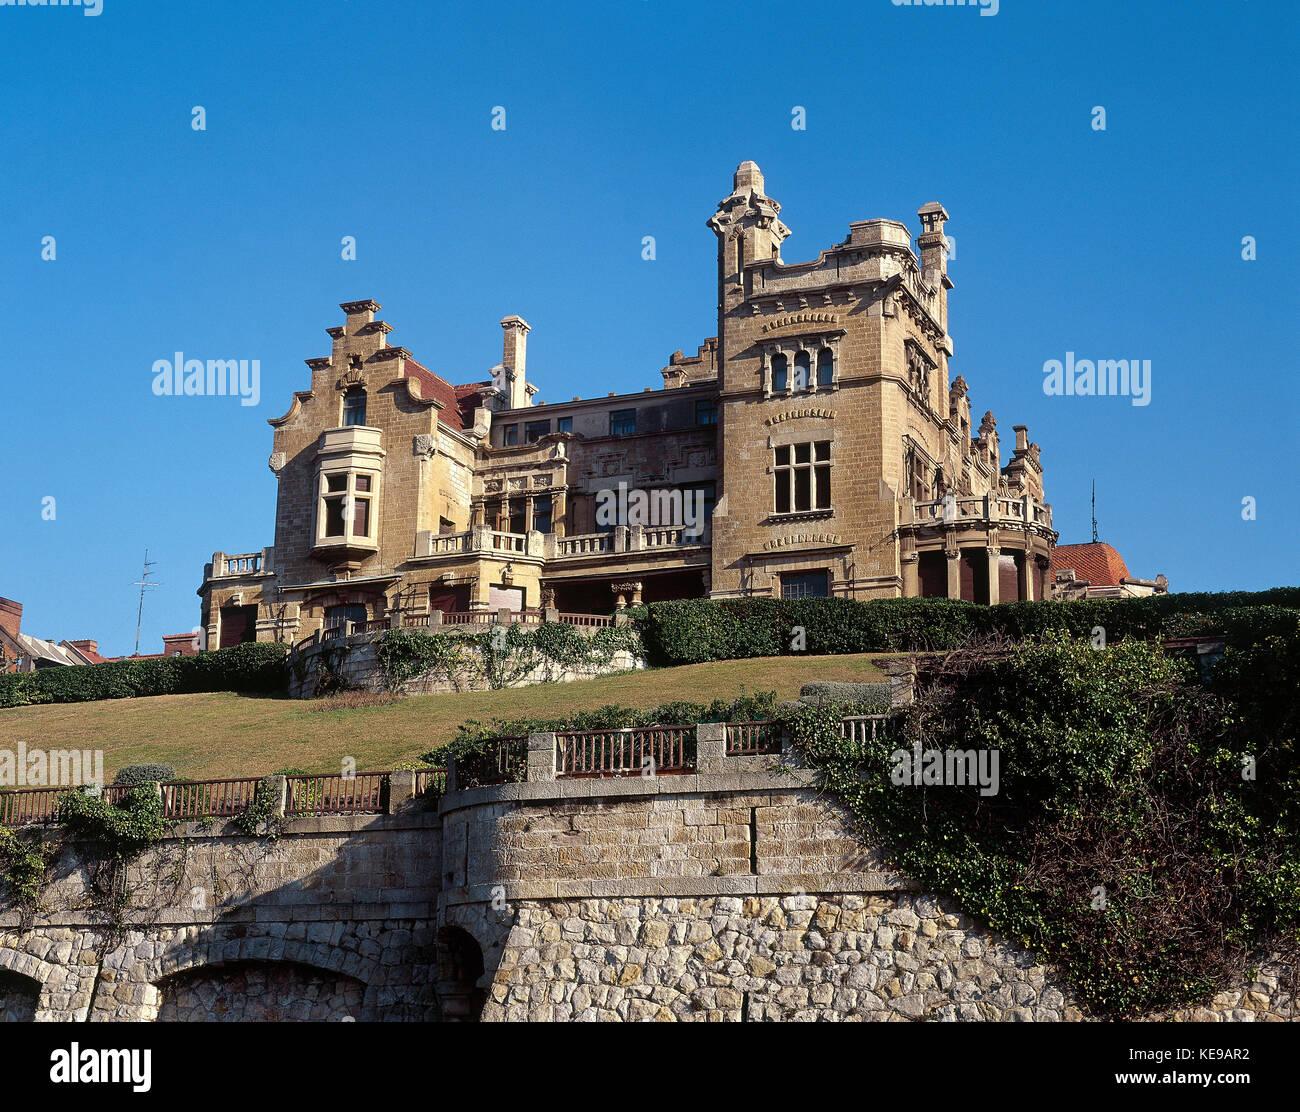 Getxo, province of Vizcaya (Bizkaia), Basque Country, Spain - Stock Image